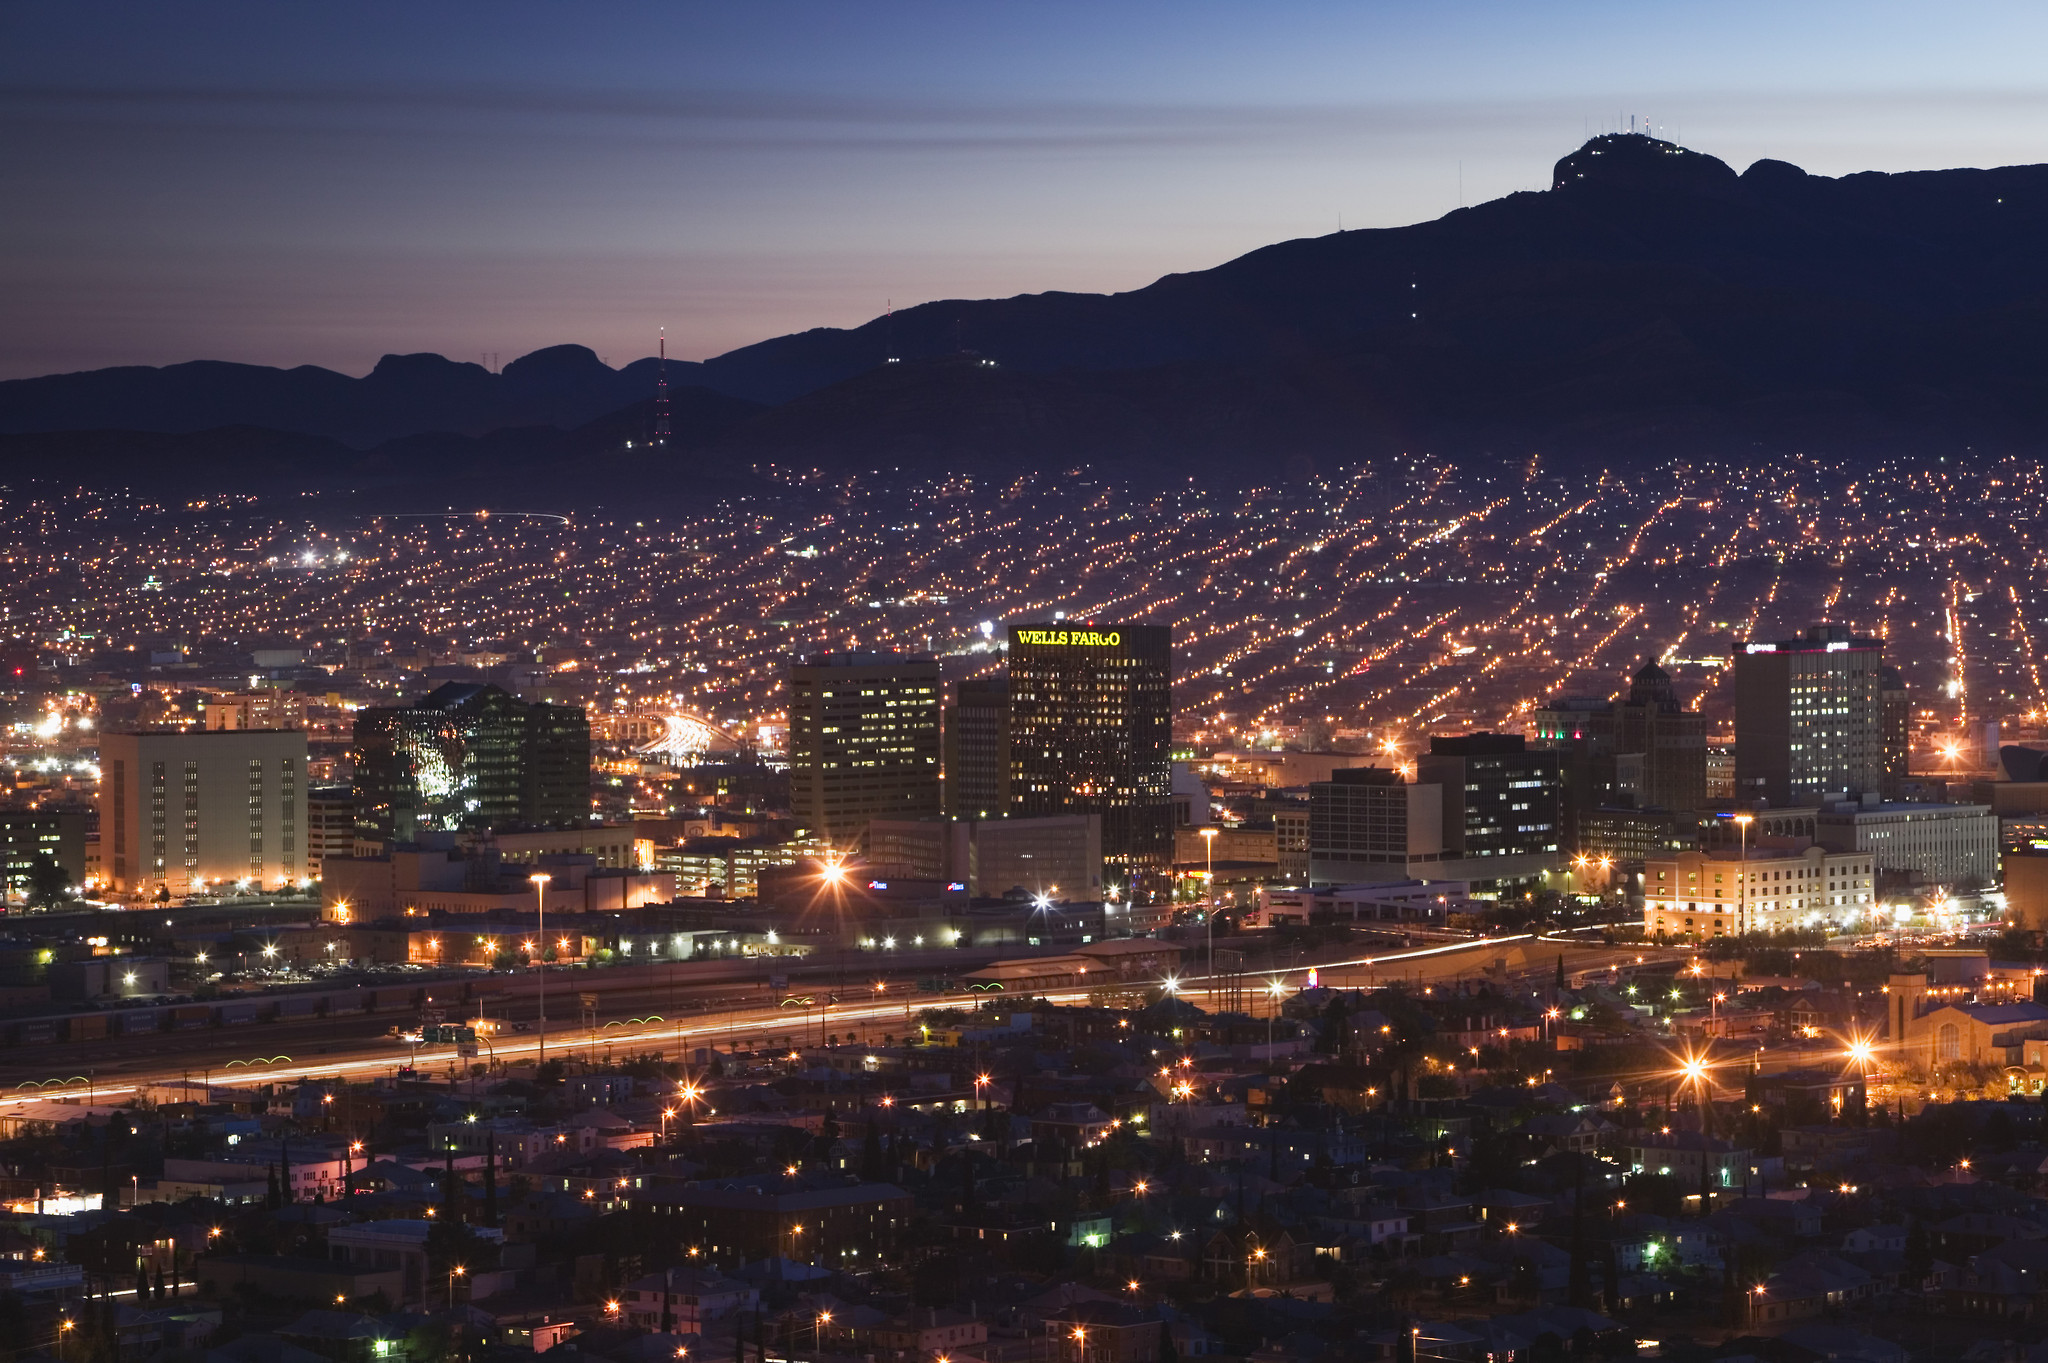 Craigslist El Paso Texas, Fraud Bloggs — 6 YR OLD PAINT ...